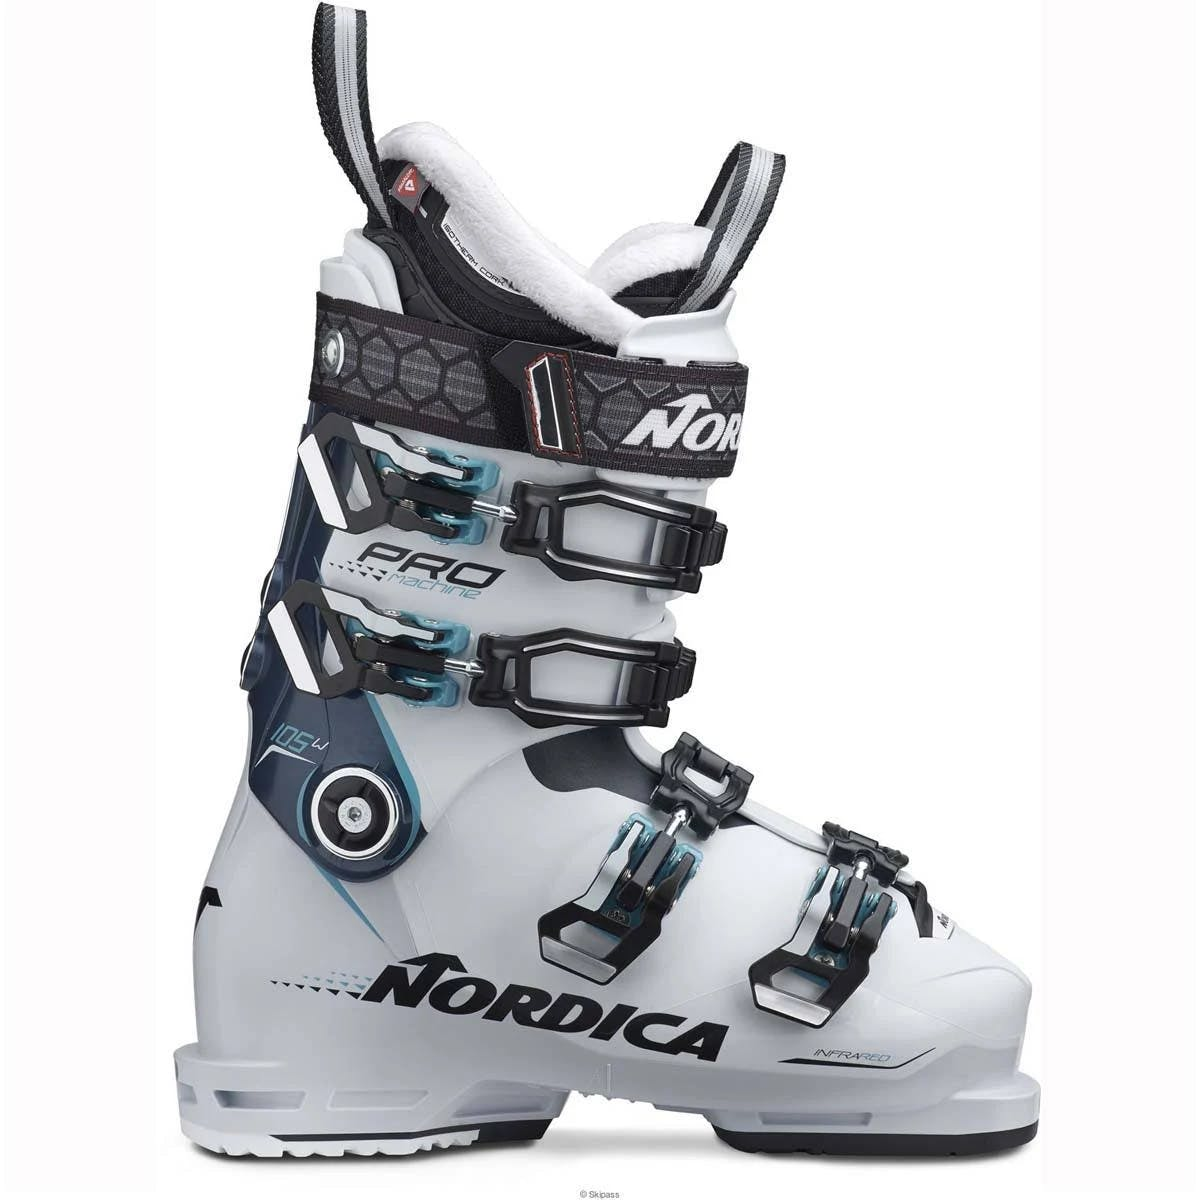 Nordica  Pro Machine 105 Women's Ski Boots · 2021